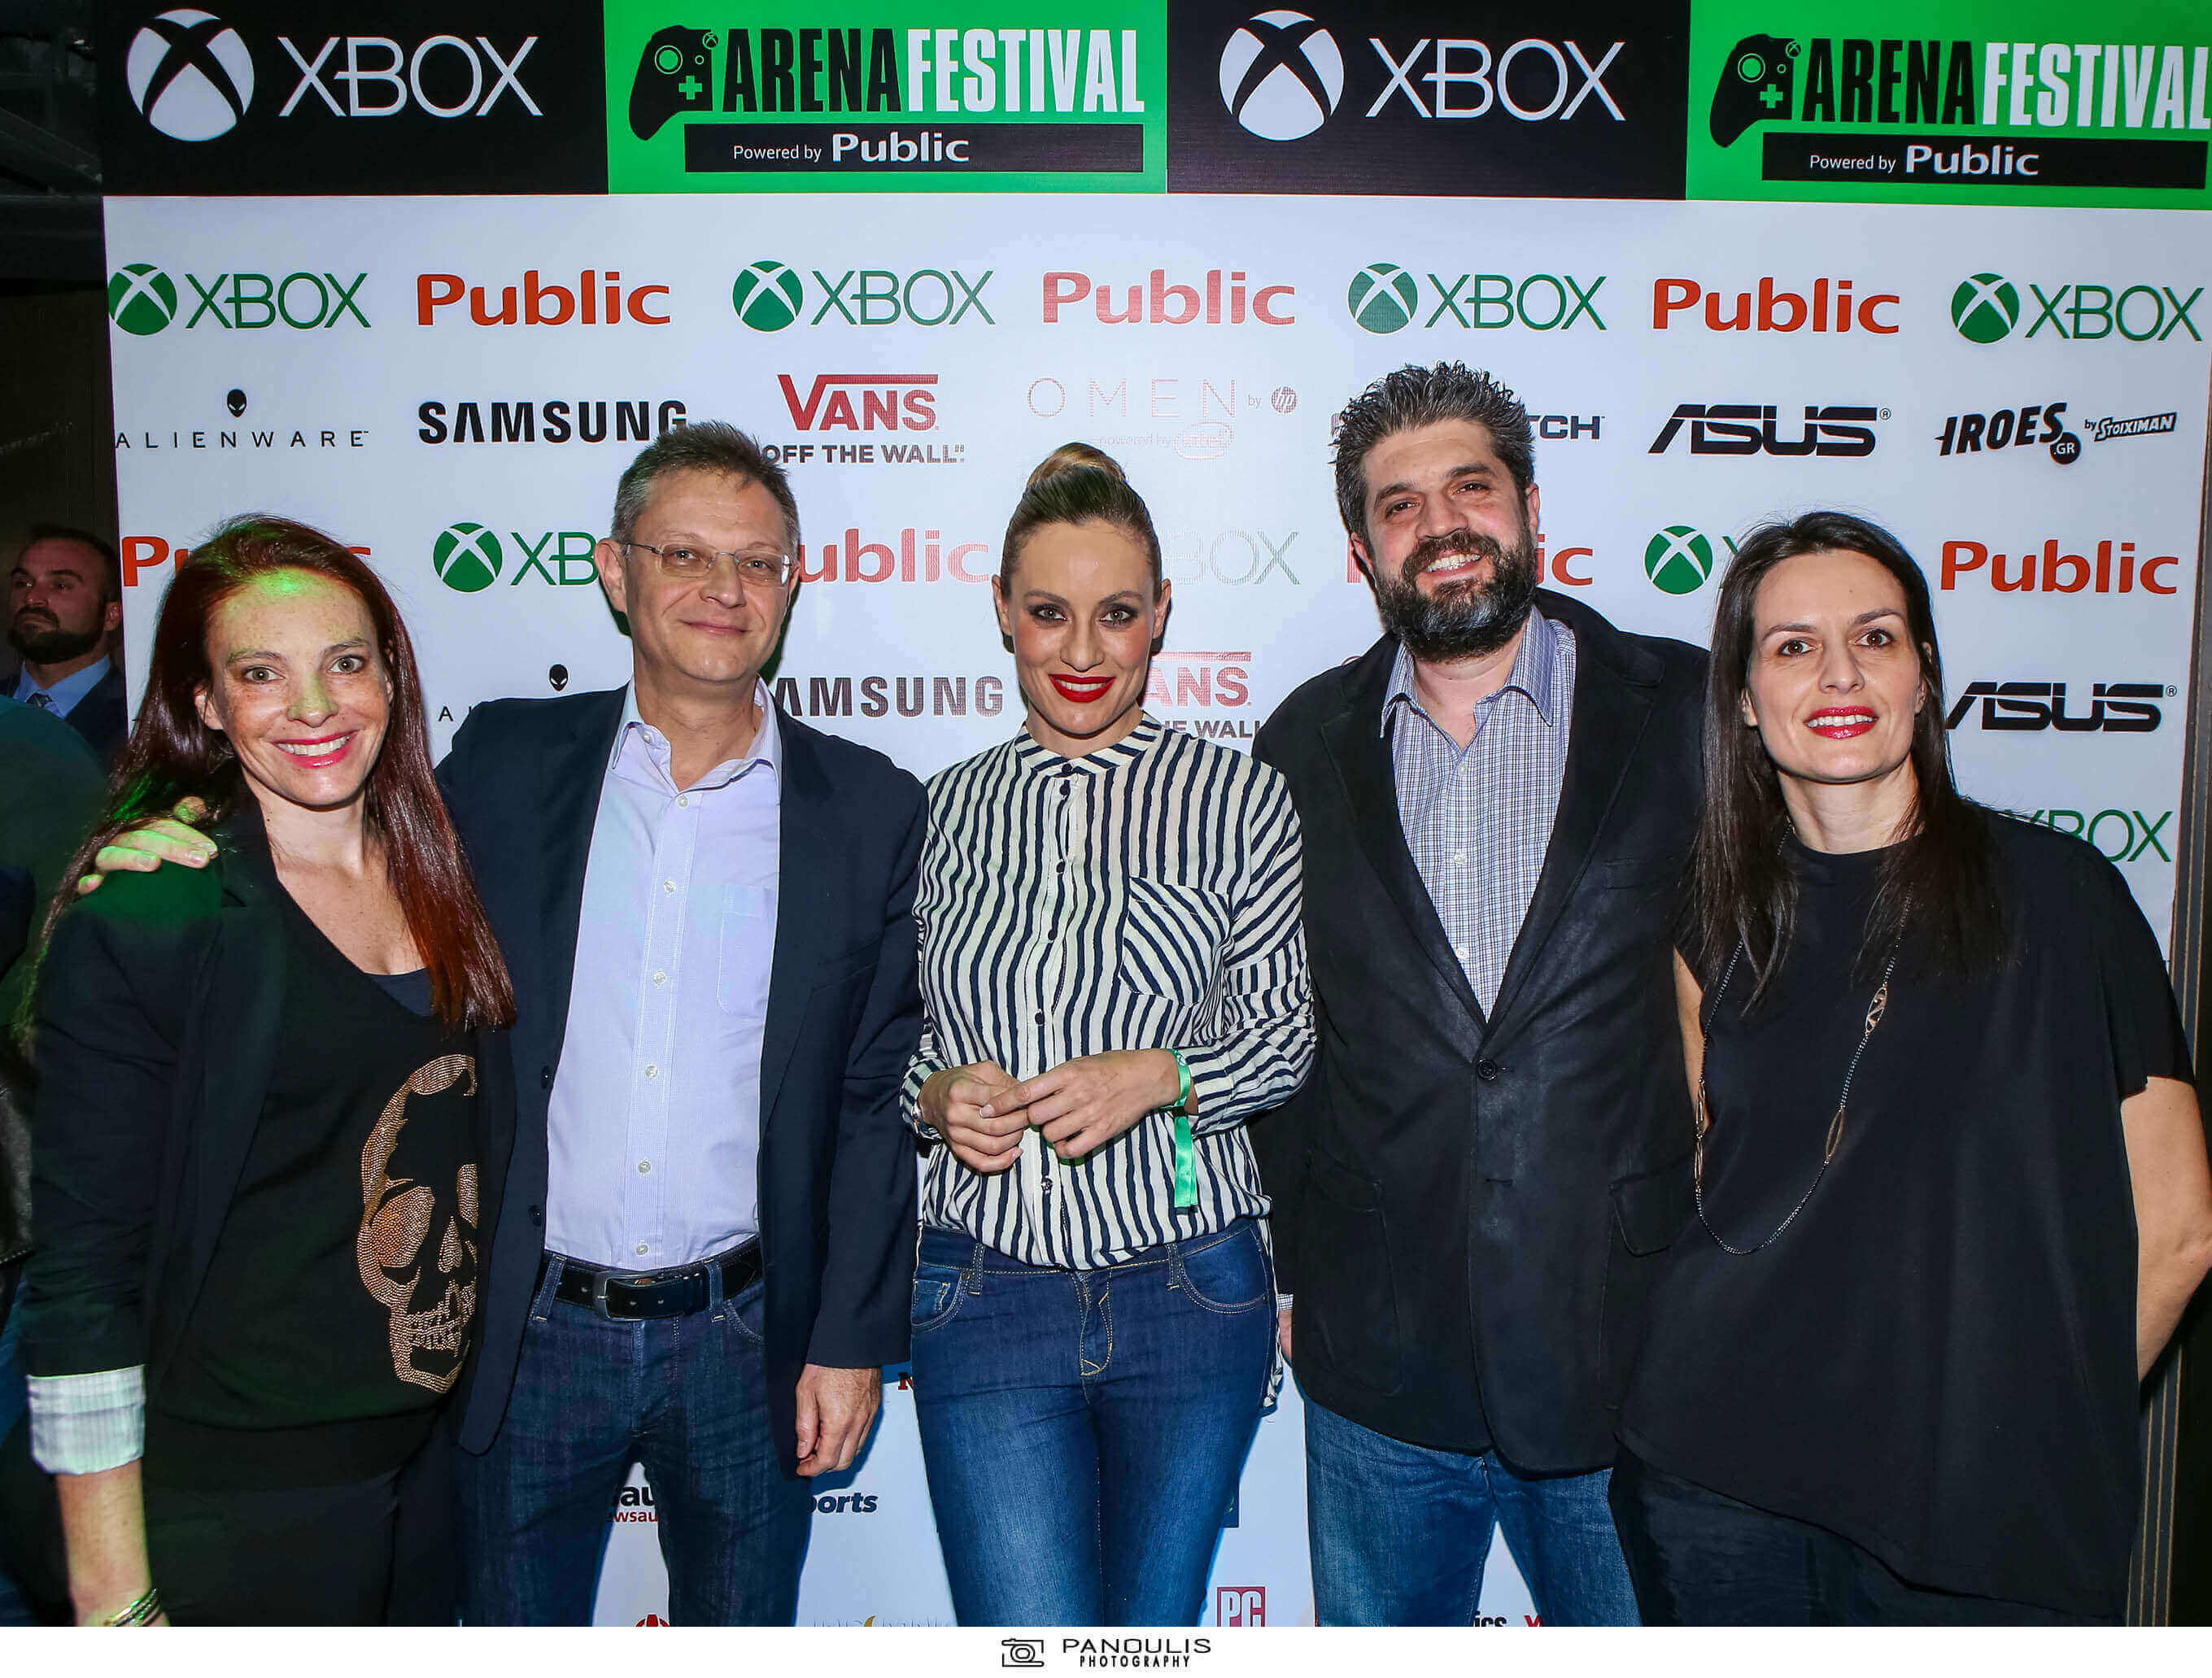 Xbox Arena Festival_11